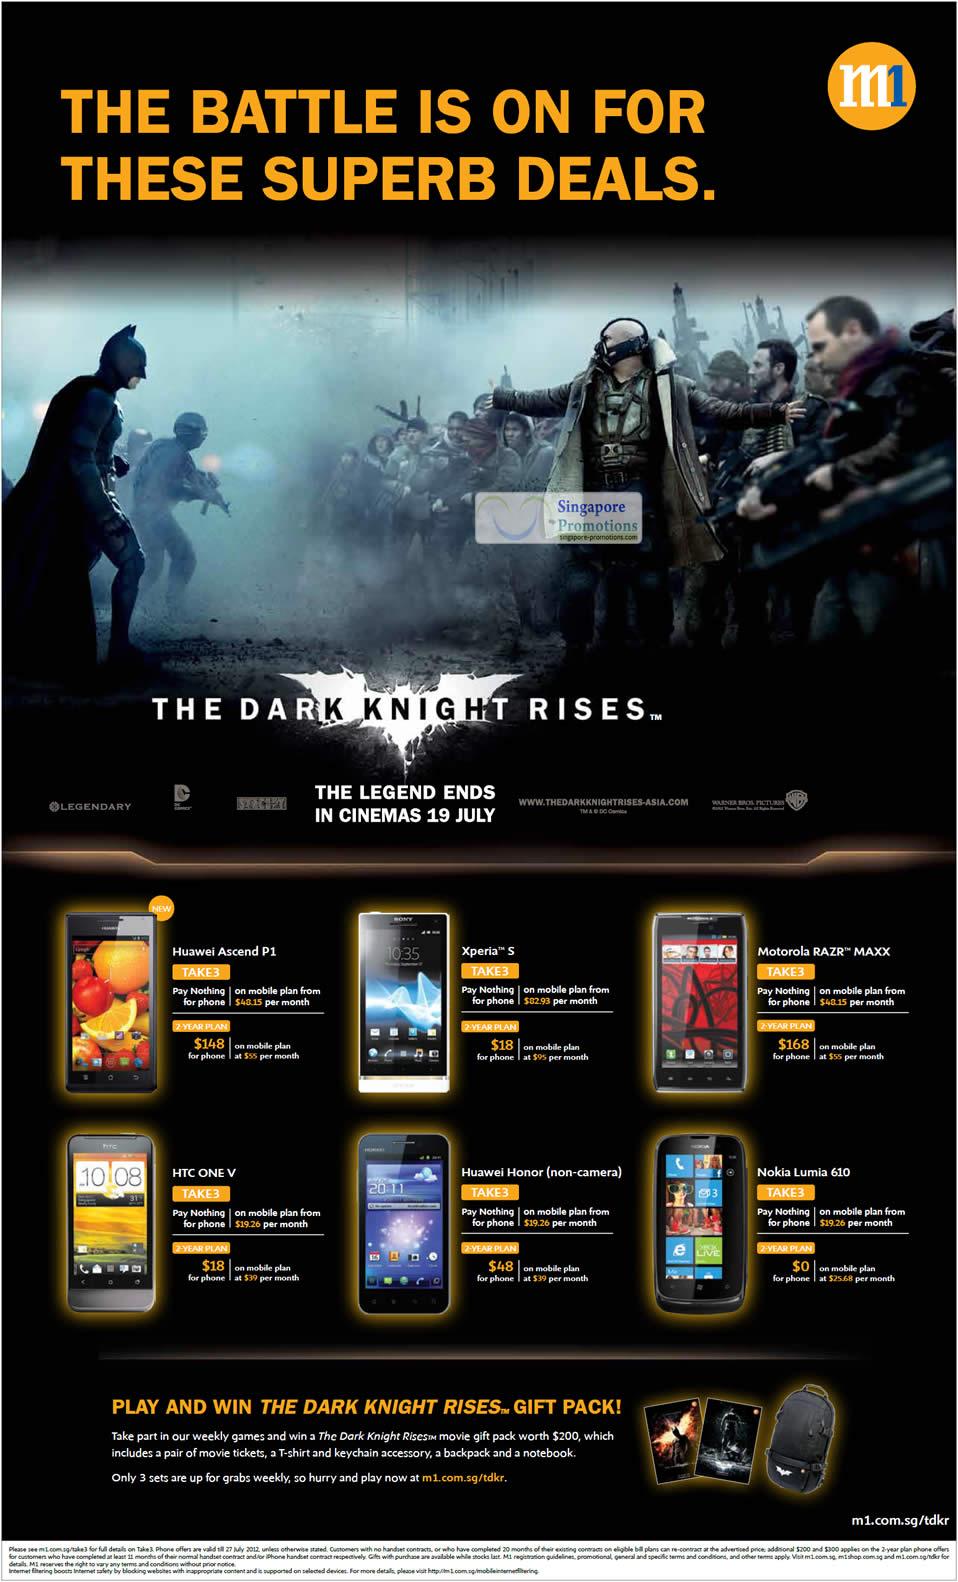 Huawei Ascend P1, Honor, Sony Xperia S, Motorola Razr Maxx, HTC One V, Nokia Lumia 610